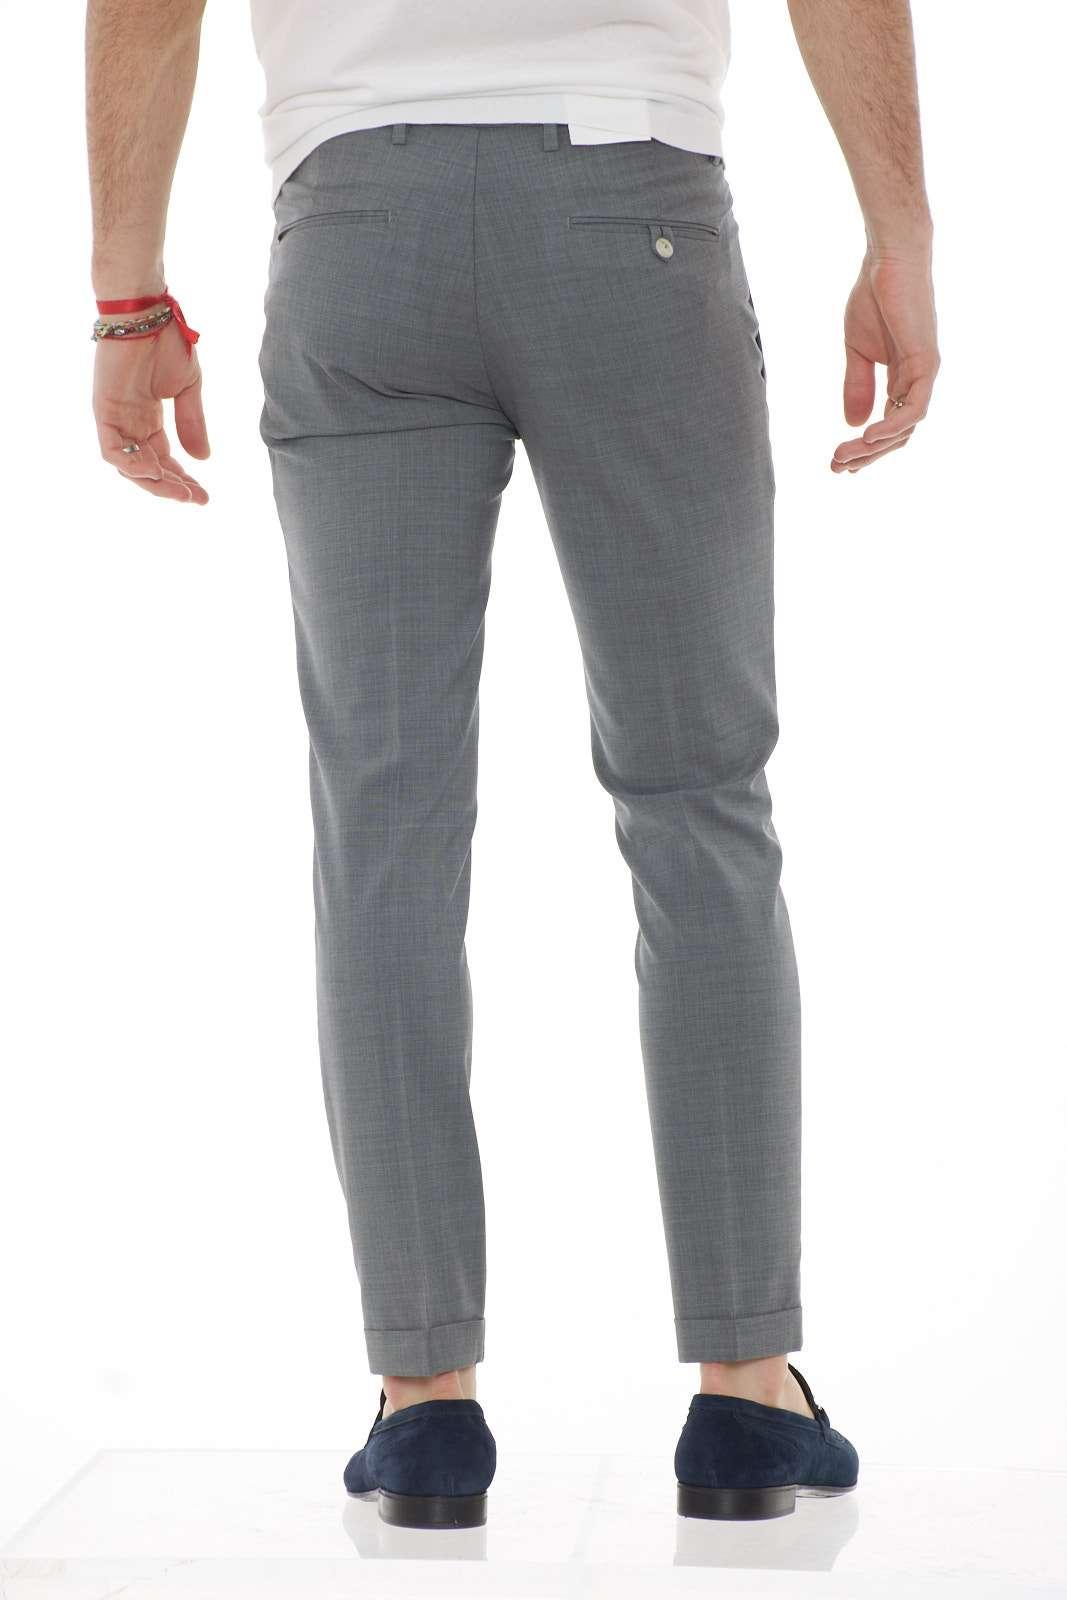 https://www.parmax.com/media/catalog/product/a/i/PE-outlet_parmax-pantaloni-uomo-Michael-Coal-FREDERICK3343-C.jpg